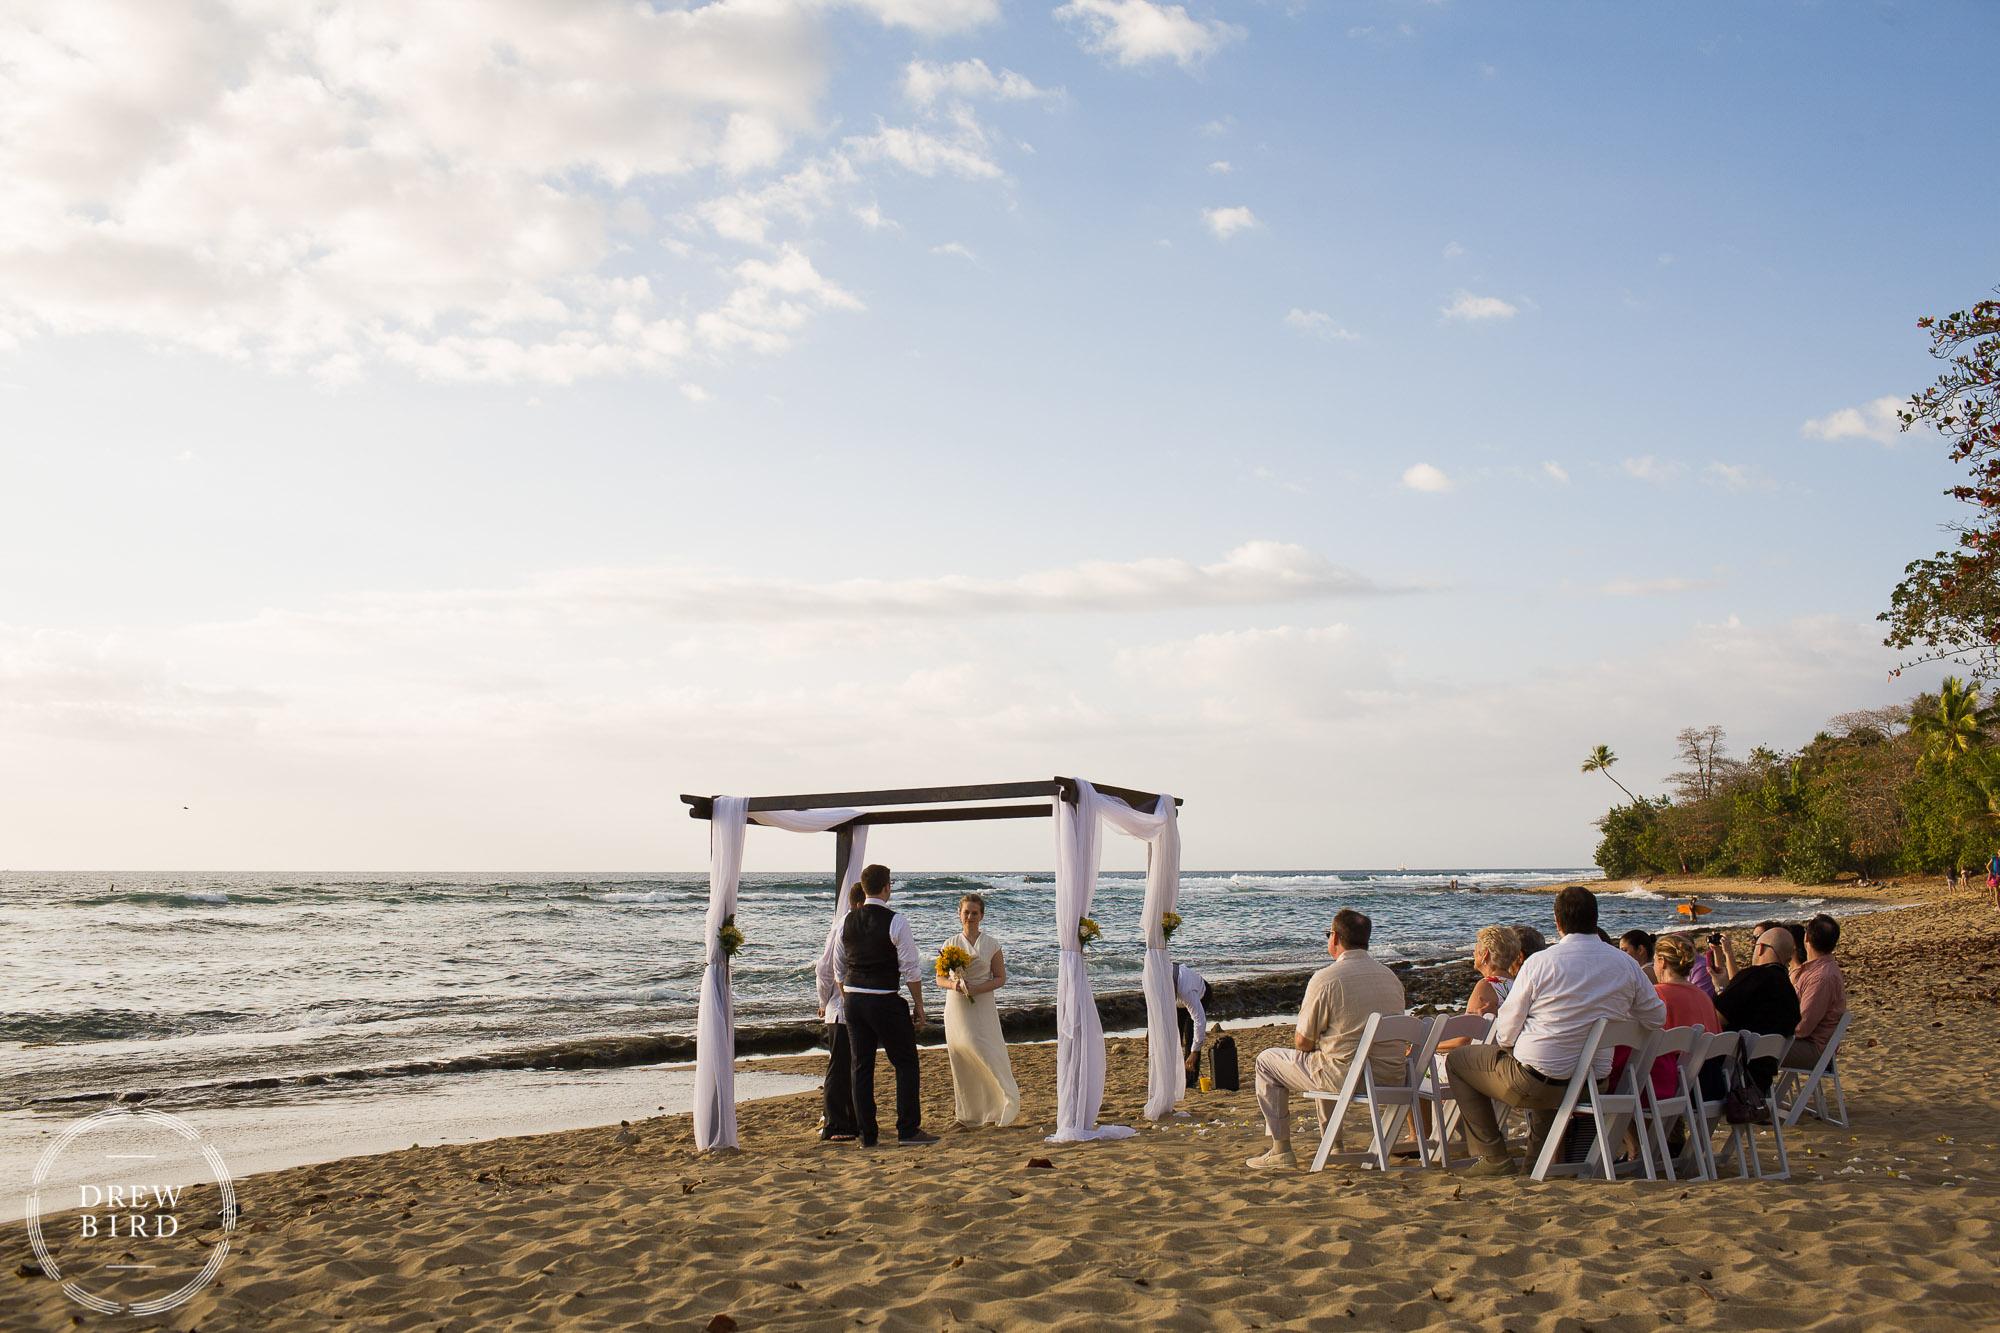 Micro wedding ceremony at sunset on the beach. Rincon Puerto Rico beach wedding. Destination wedding photographer Drew Bird. Villa Playa Maria wedding photography.